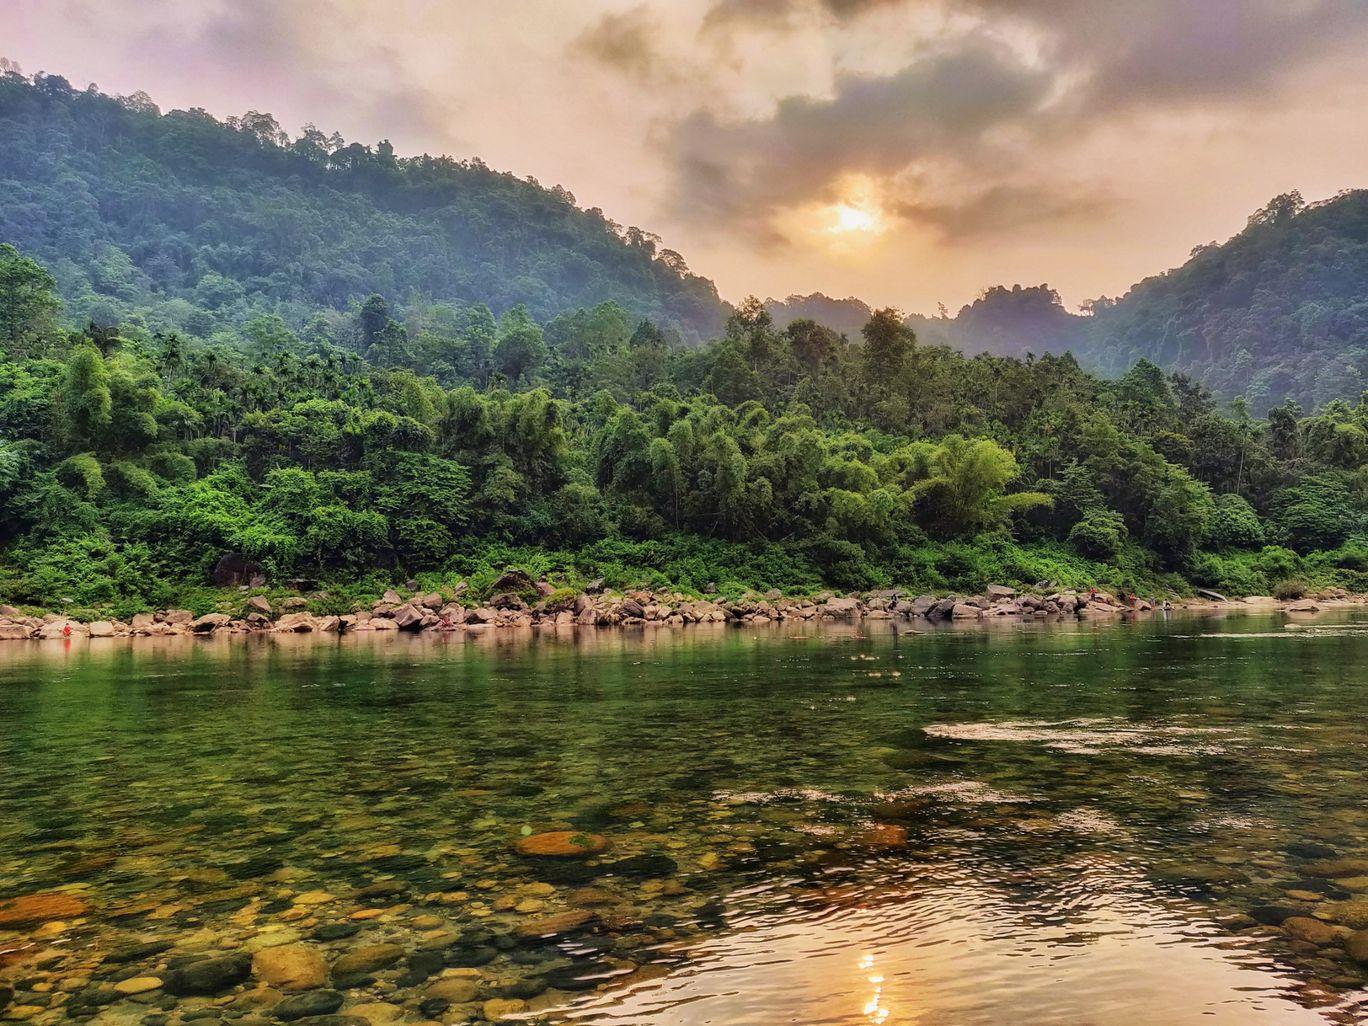 Photo of Umngot River Camp By Vaibhav Jagtap